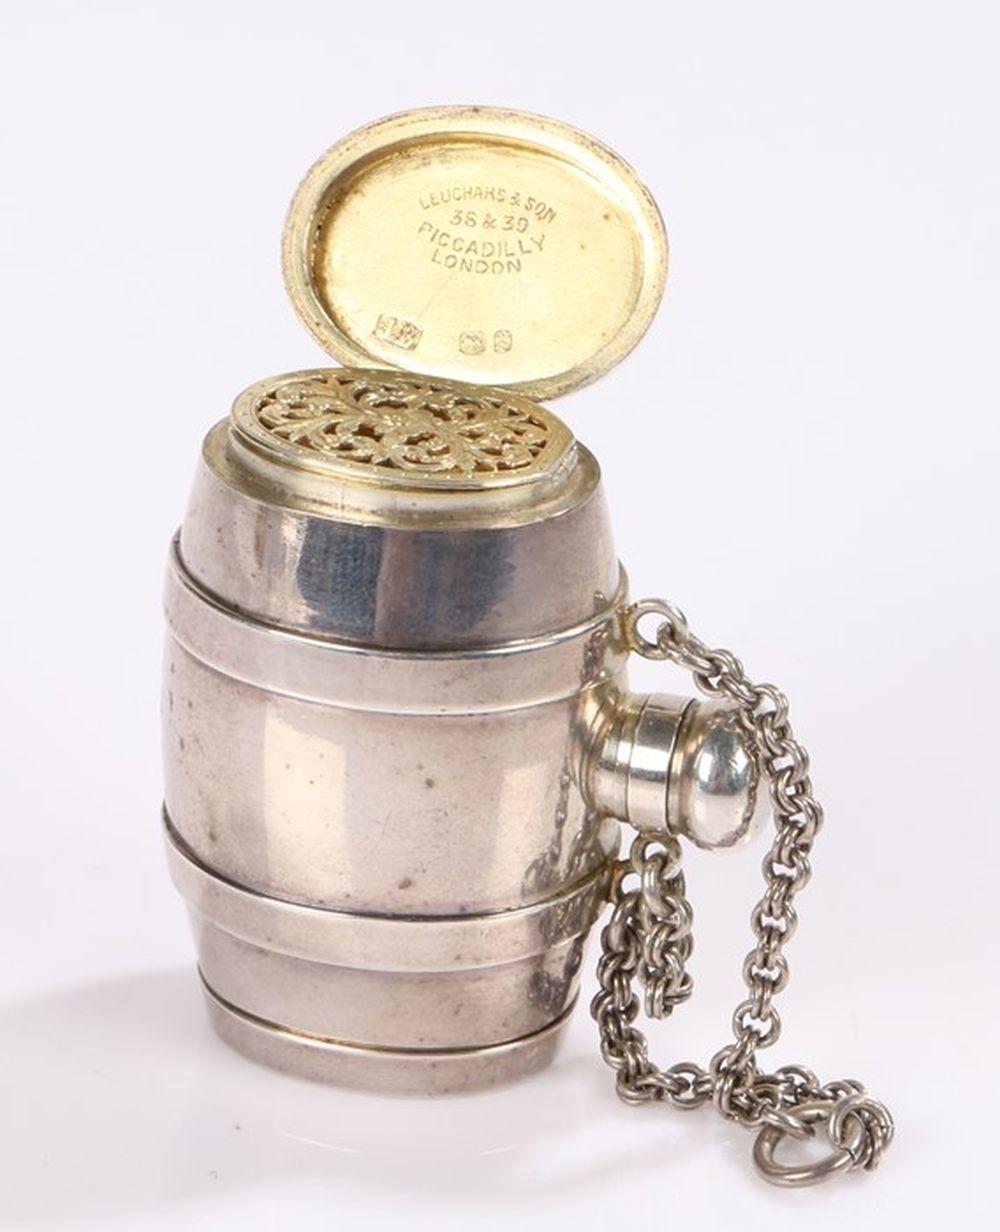 Victorian novelty silver scent bottle/ vinaigrette/ pill pot, London 1870, maker JB, of barrel form